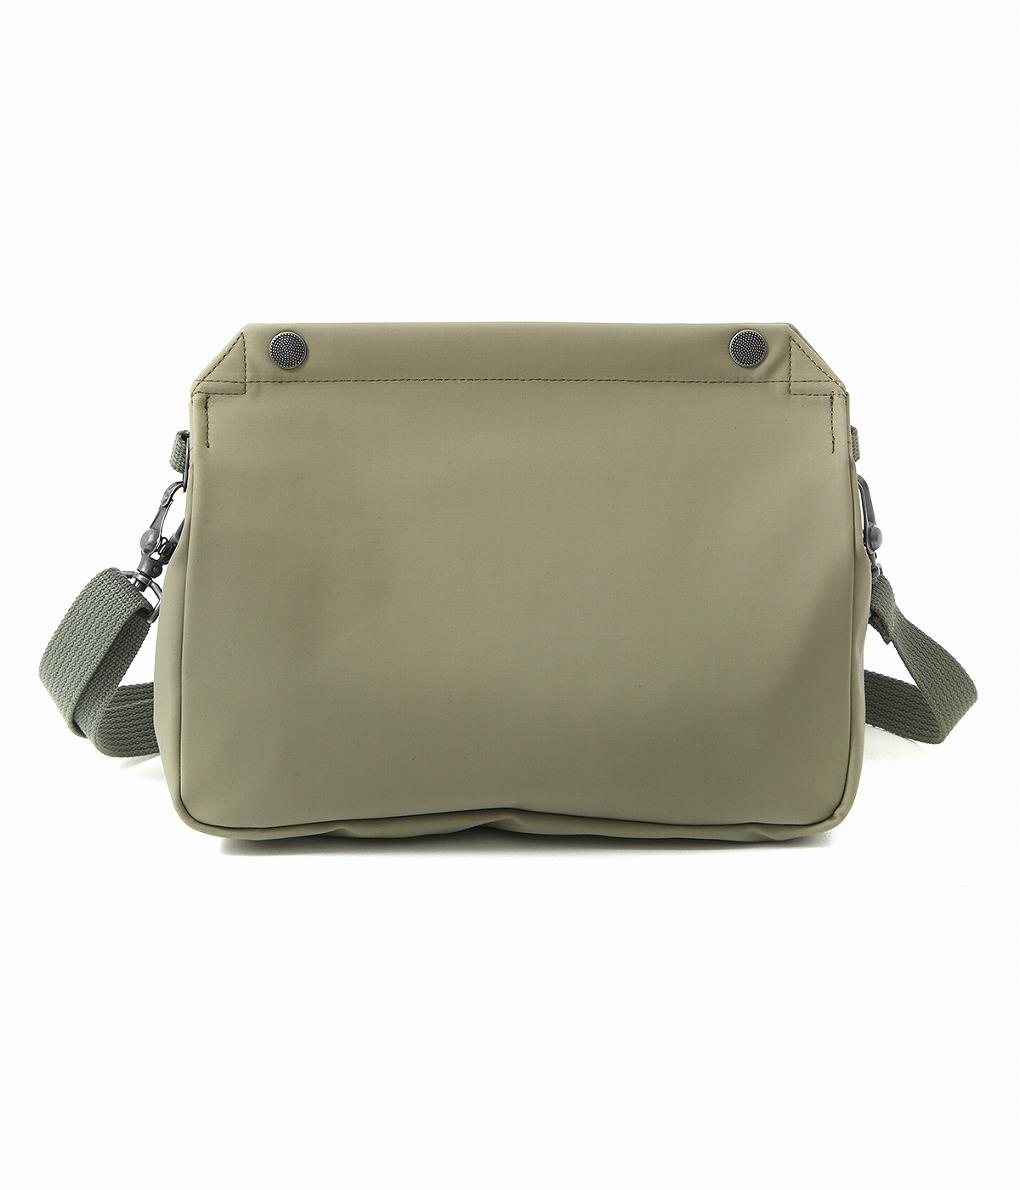 ANATOMICA / アナトミカ : SMALL SHOULDER BAG SMALL : スモール ショルダー バッグ スモール サテン メンズ : 530-541-25 【MUS】